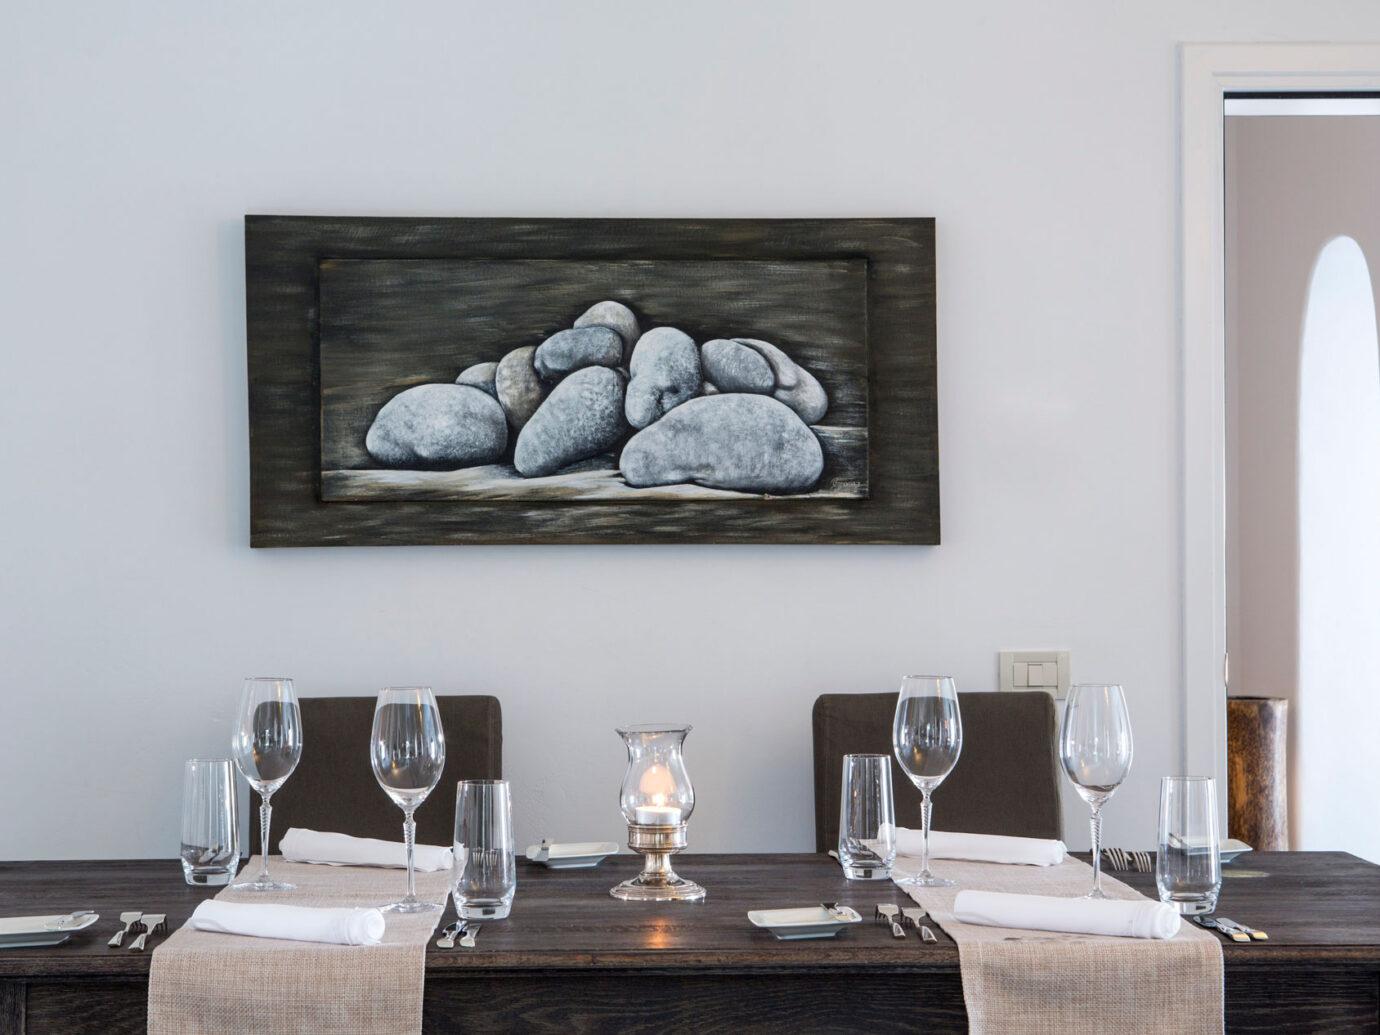 dinner table at the Myconian Ambassador Hotel, Greece